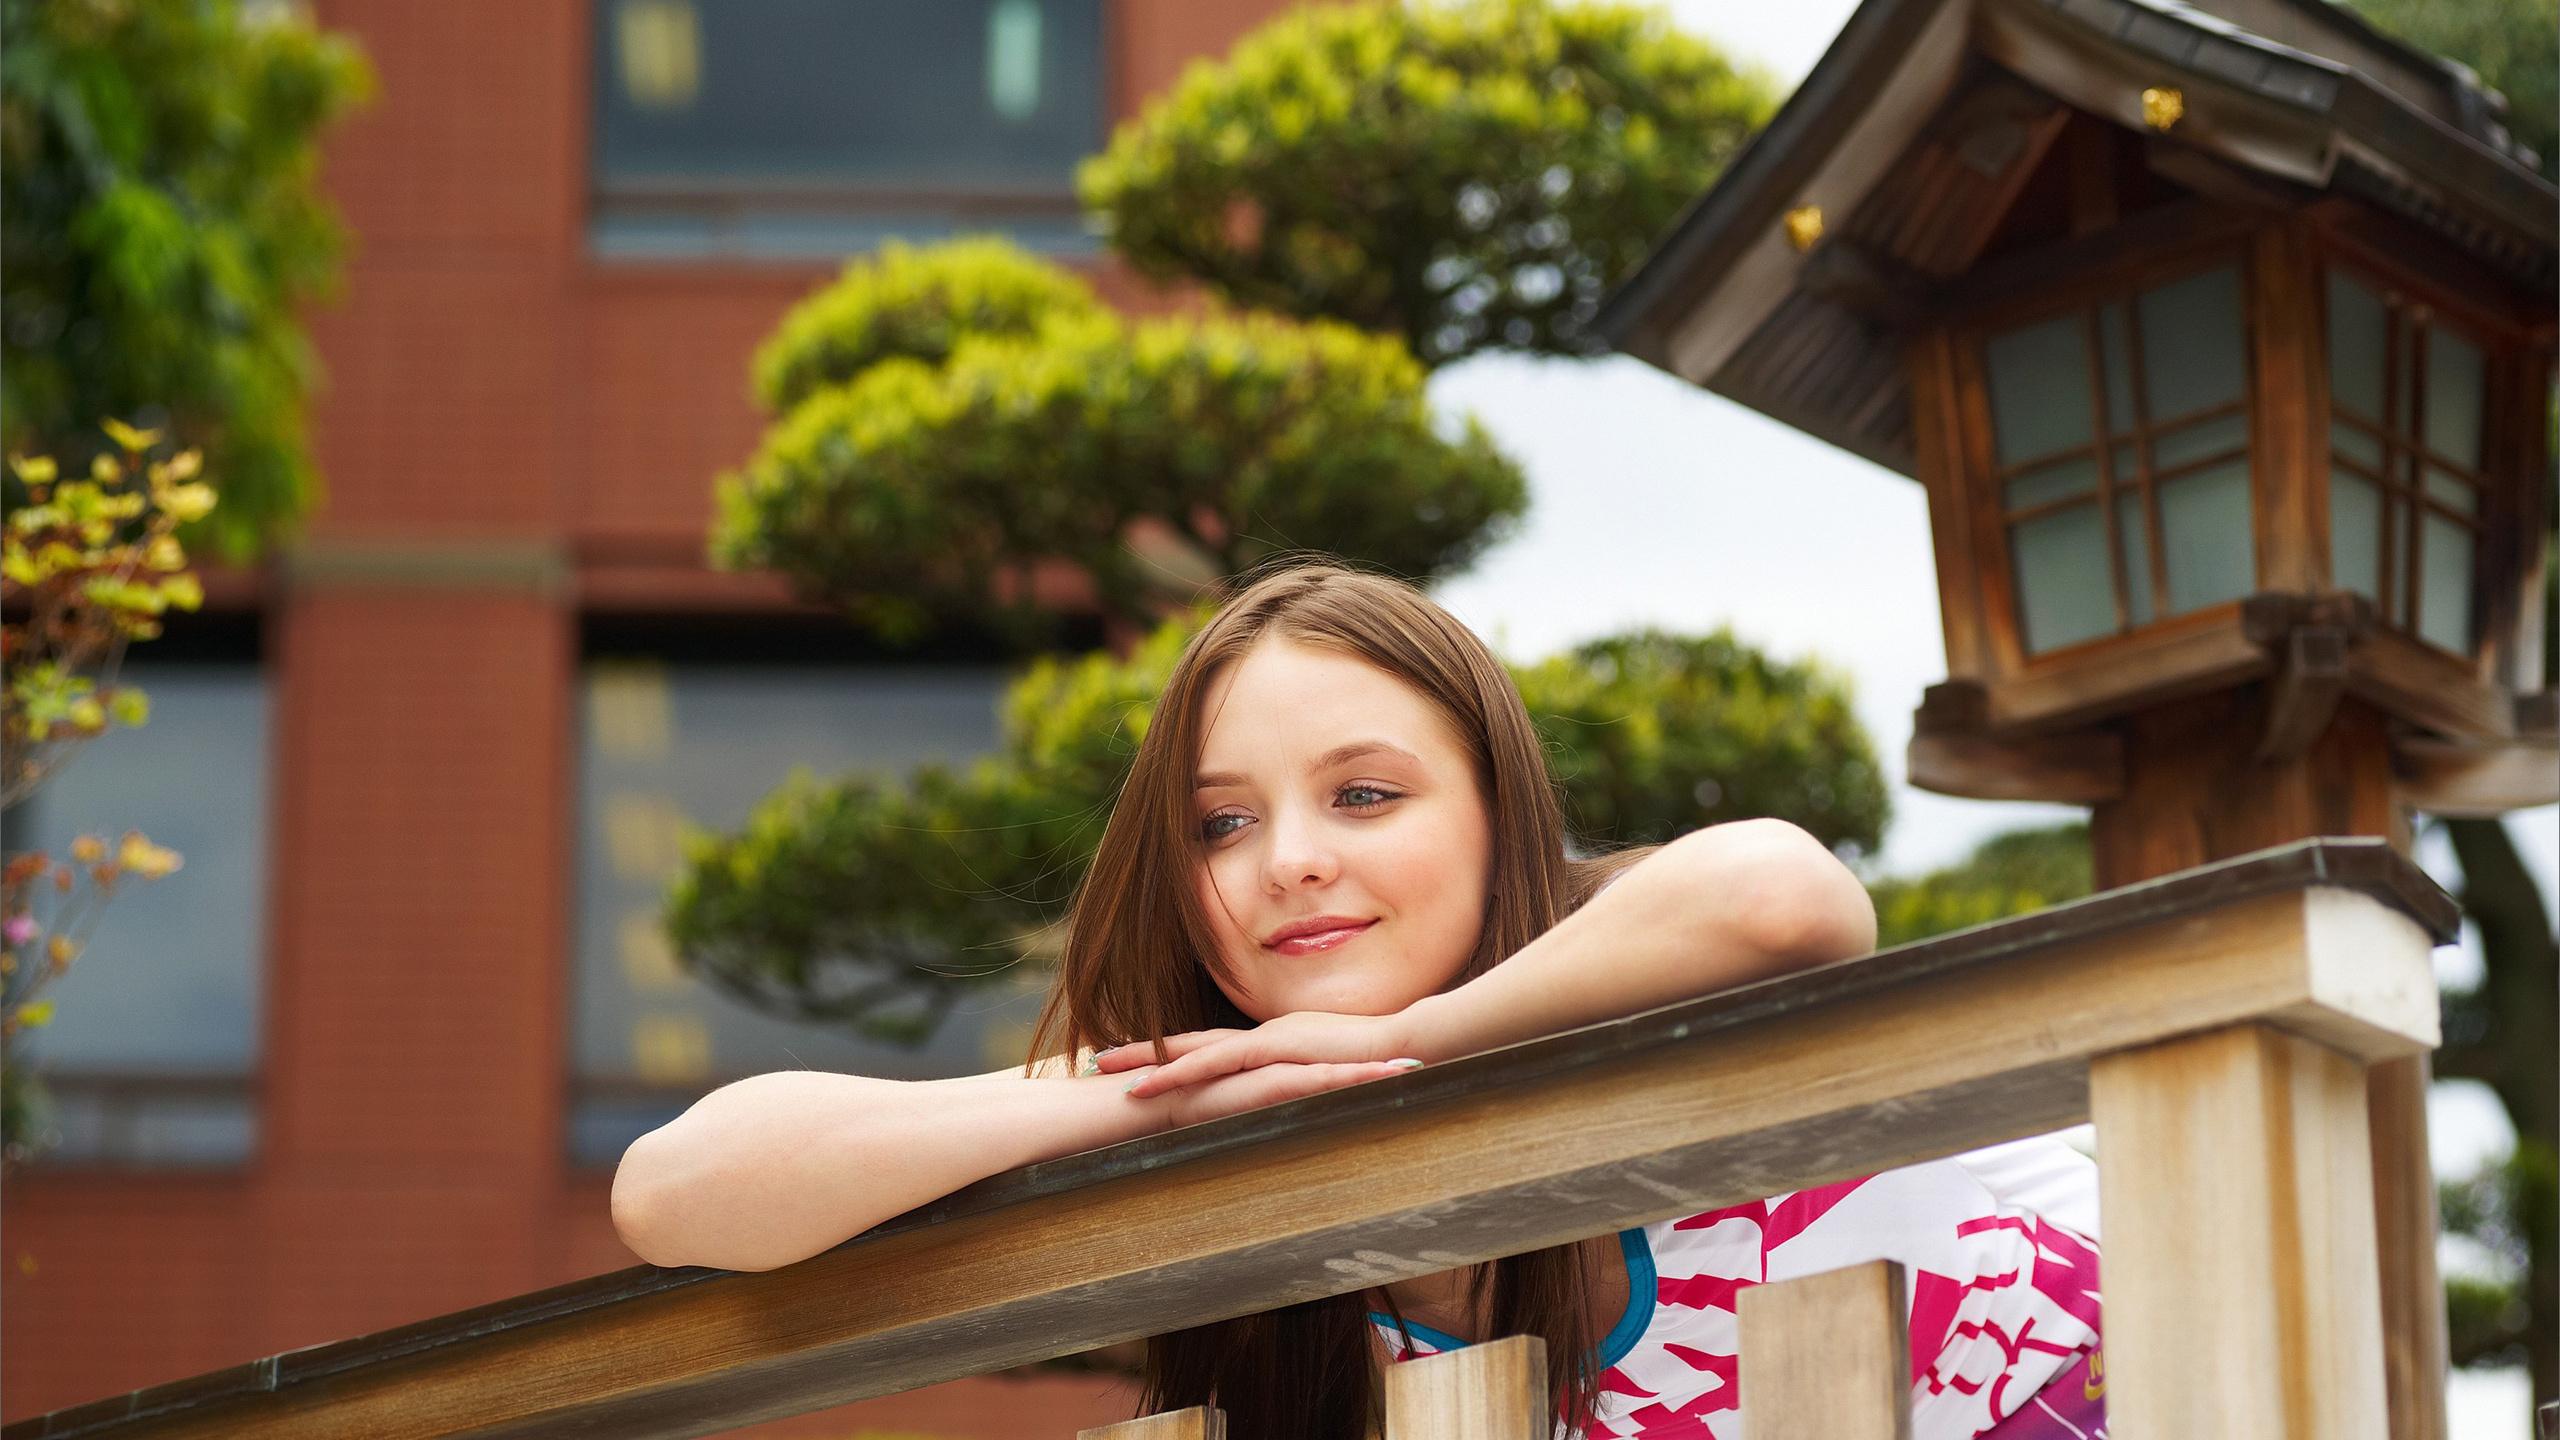 Порно трах ютуб девушка на балконе